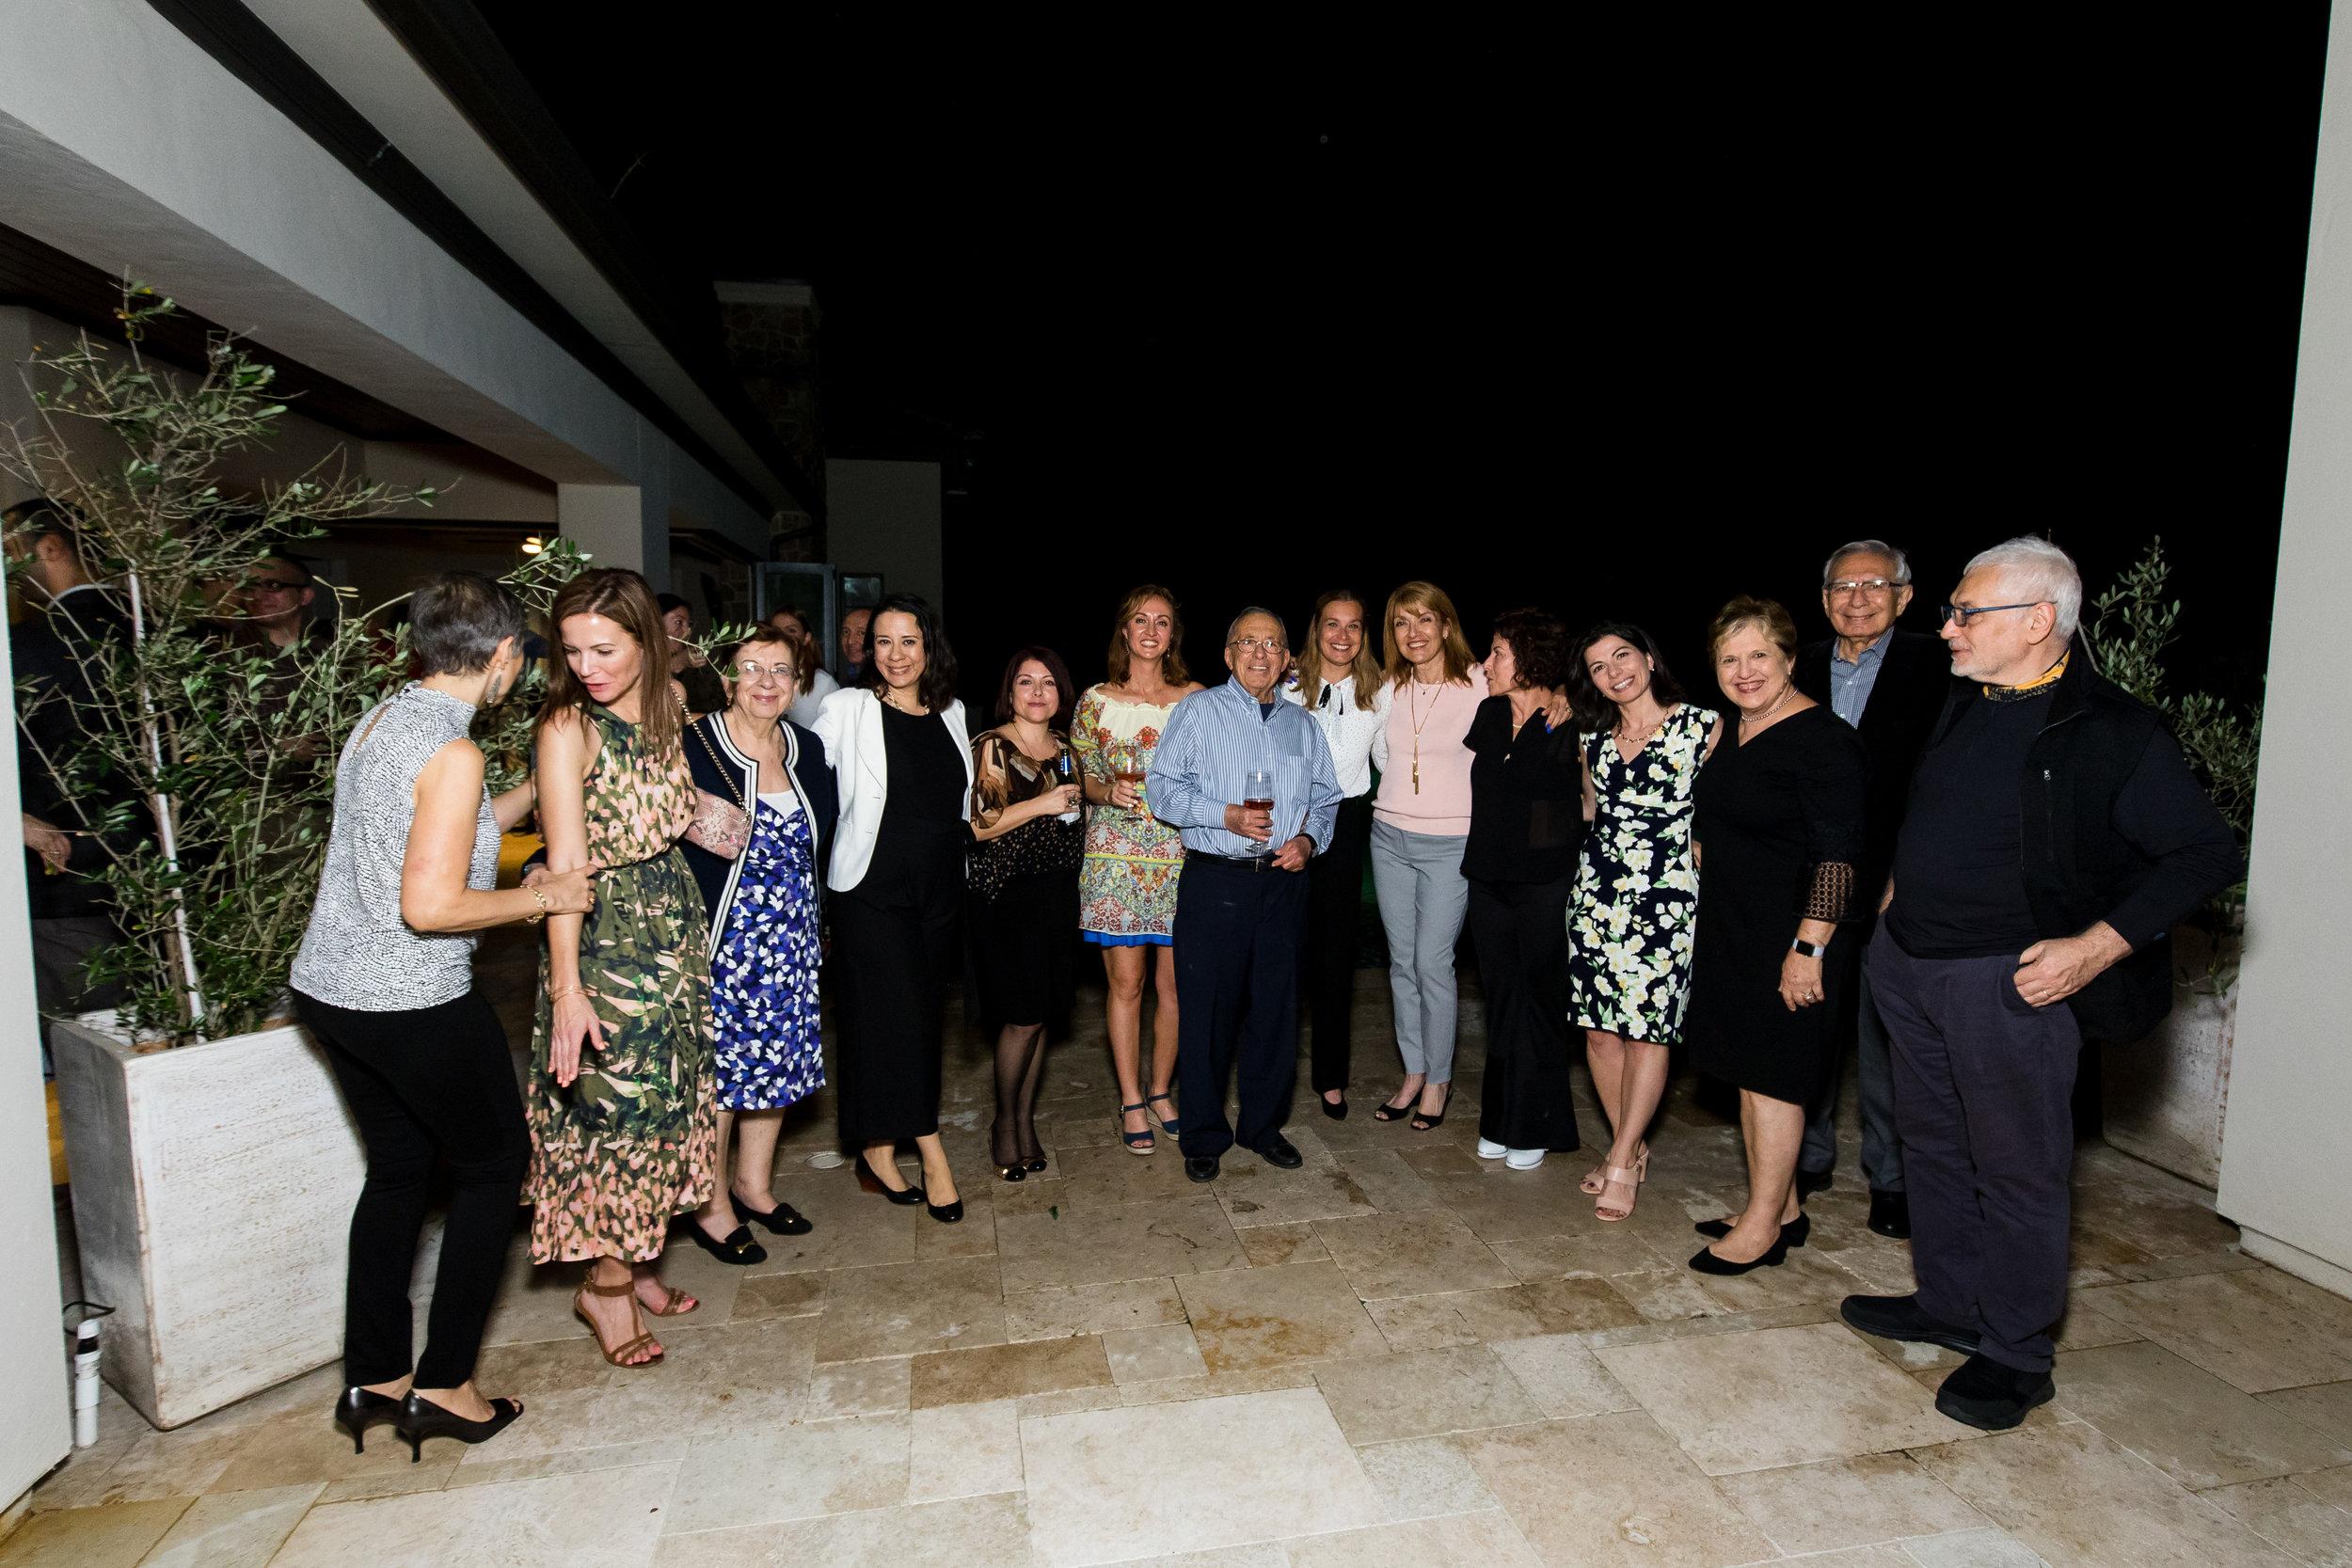 20180421-3rd Annual Education Women Turkey-383.jpg